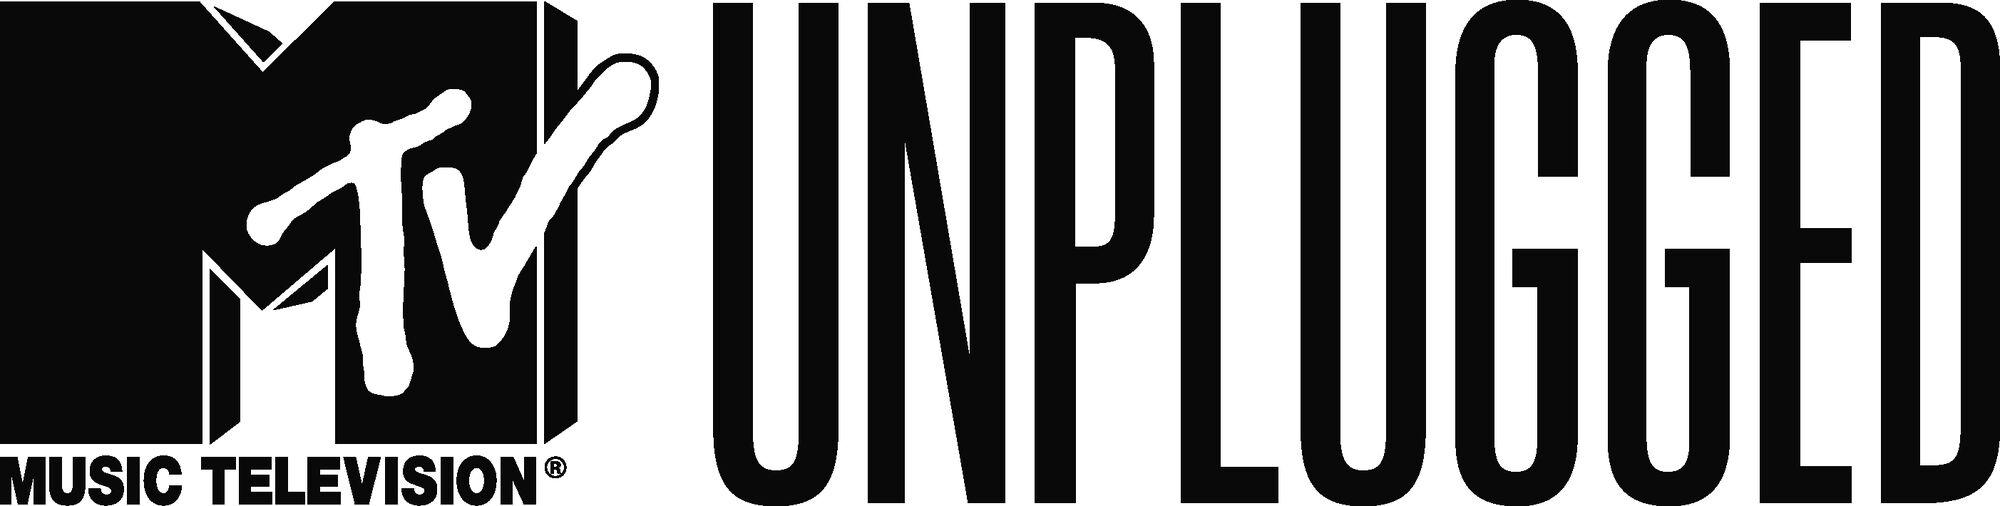 MTV Unplugged | Duran Duran Wiki | FANDOM powered by Wikia Oasis Band Logo